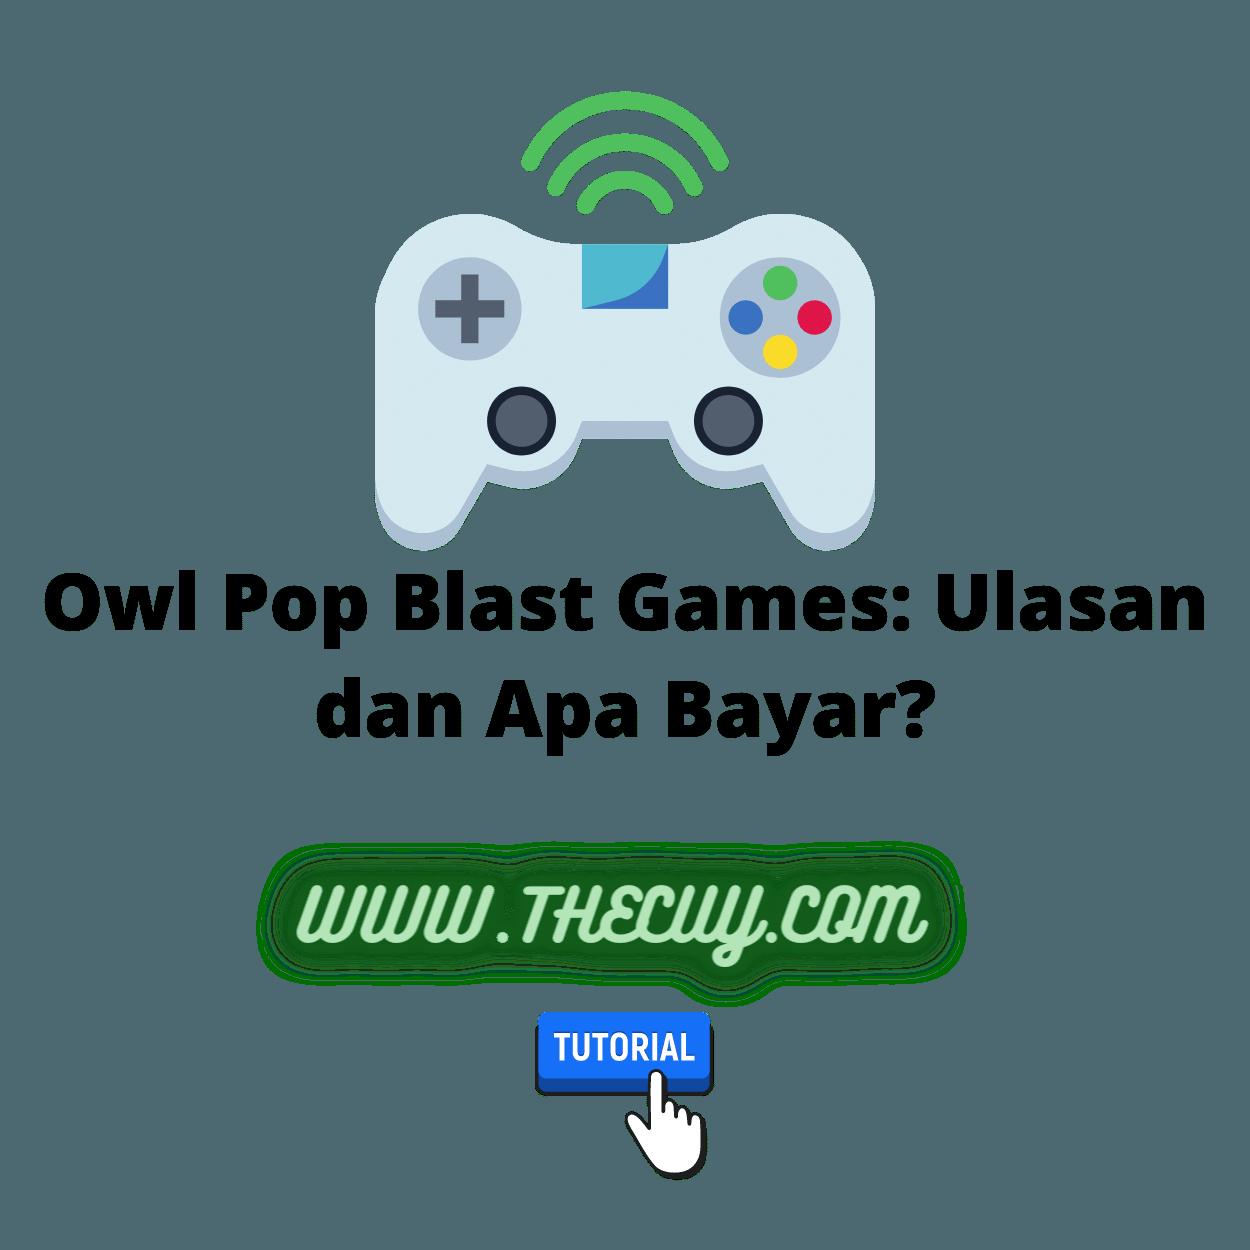 Owl Pop Blast Games: Ulasan dan Apa Bayar?